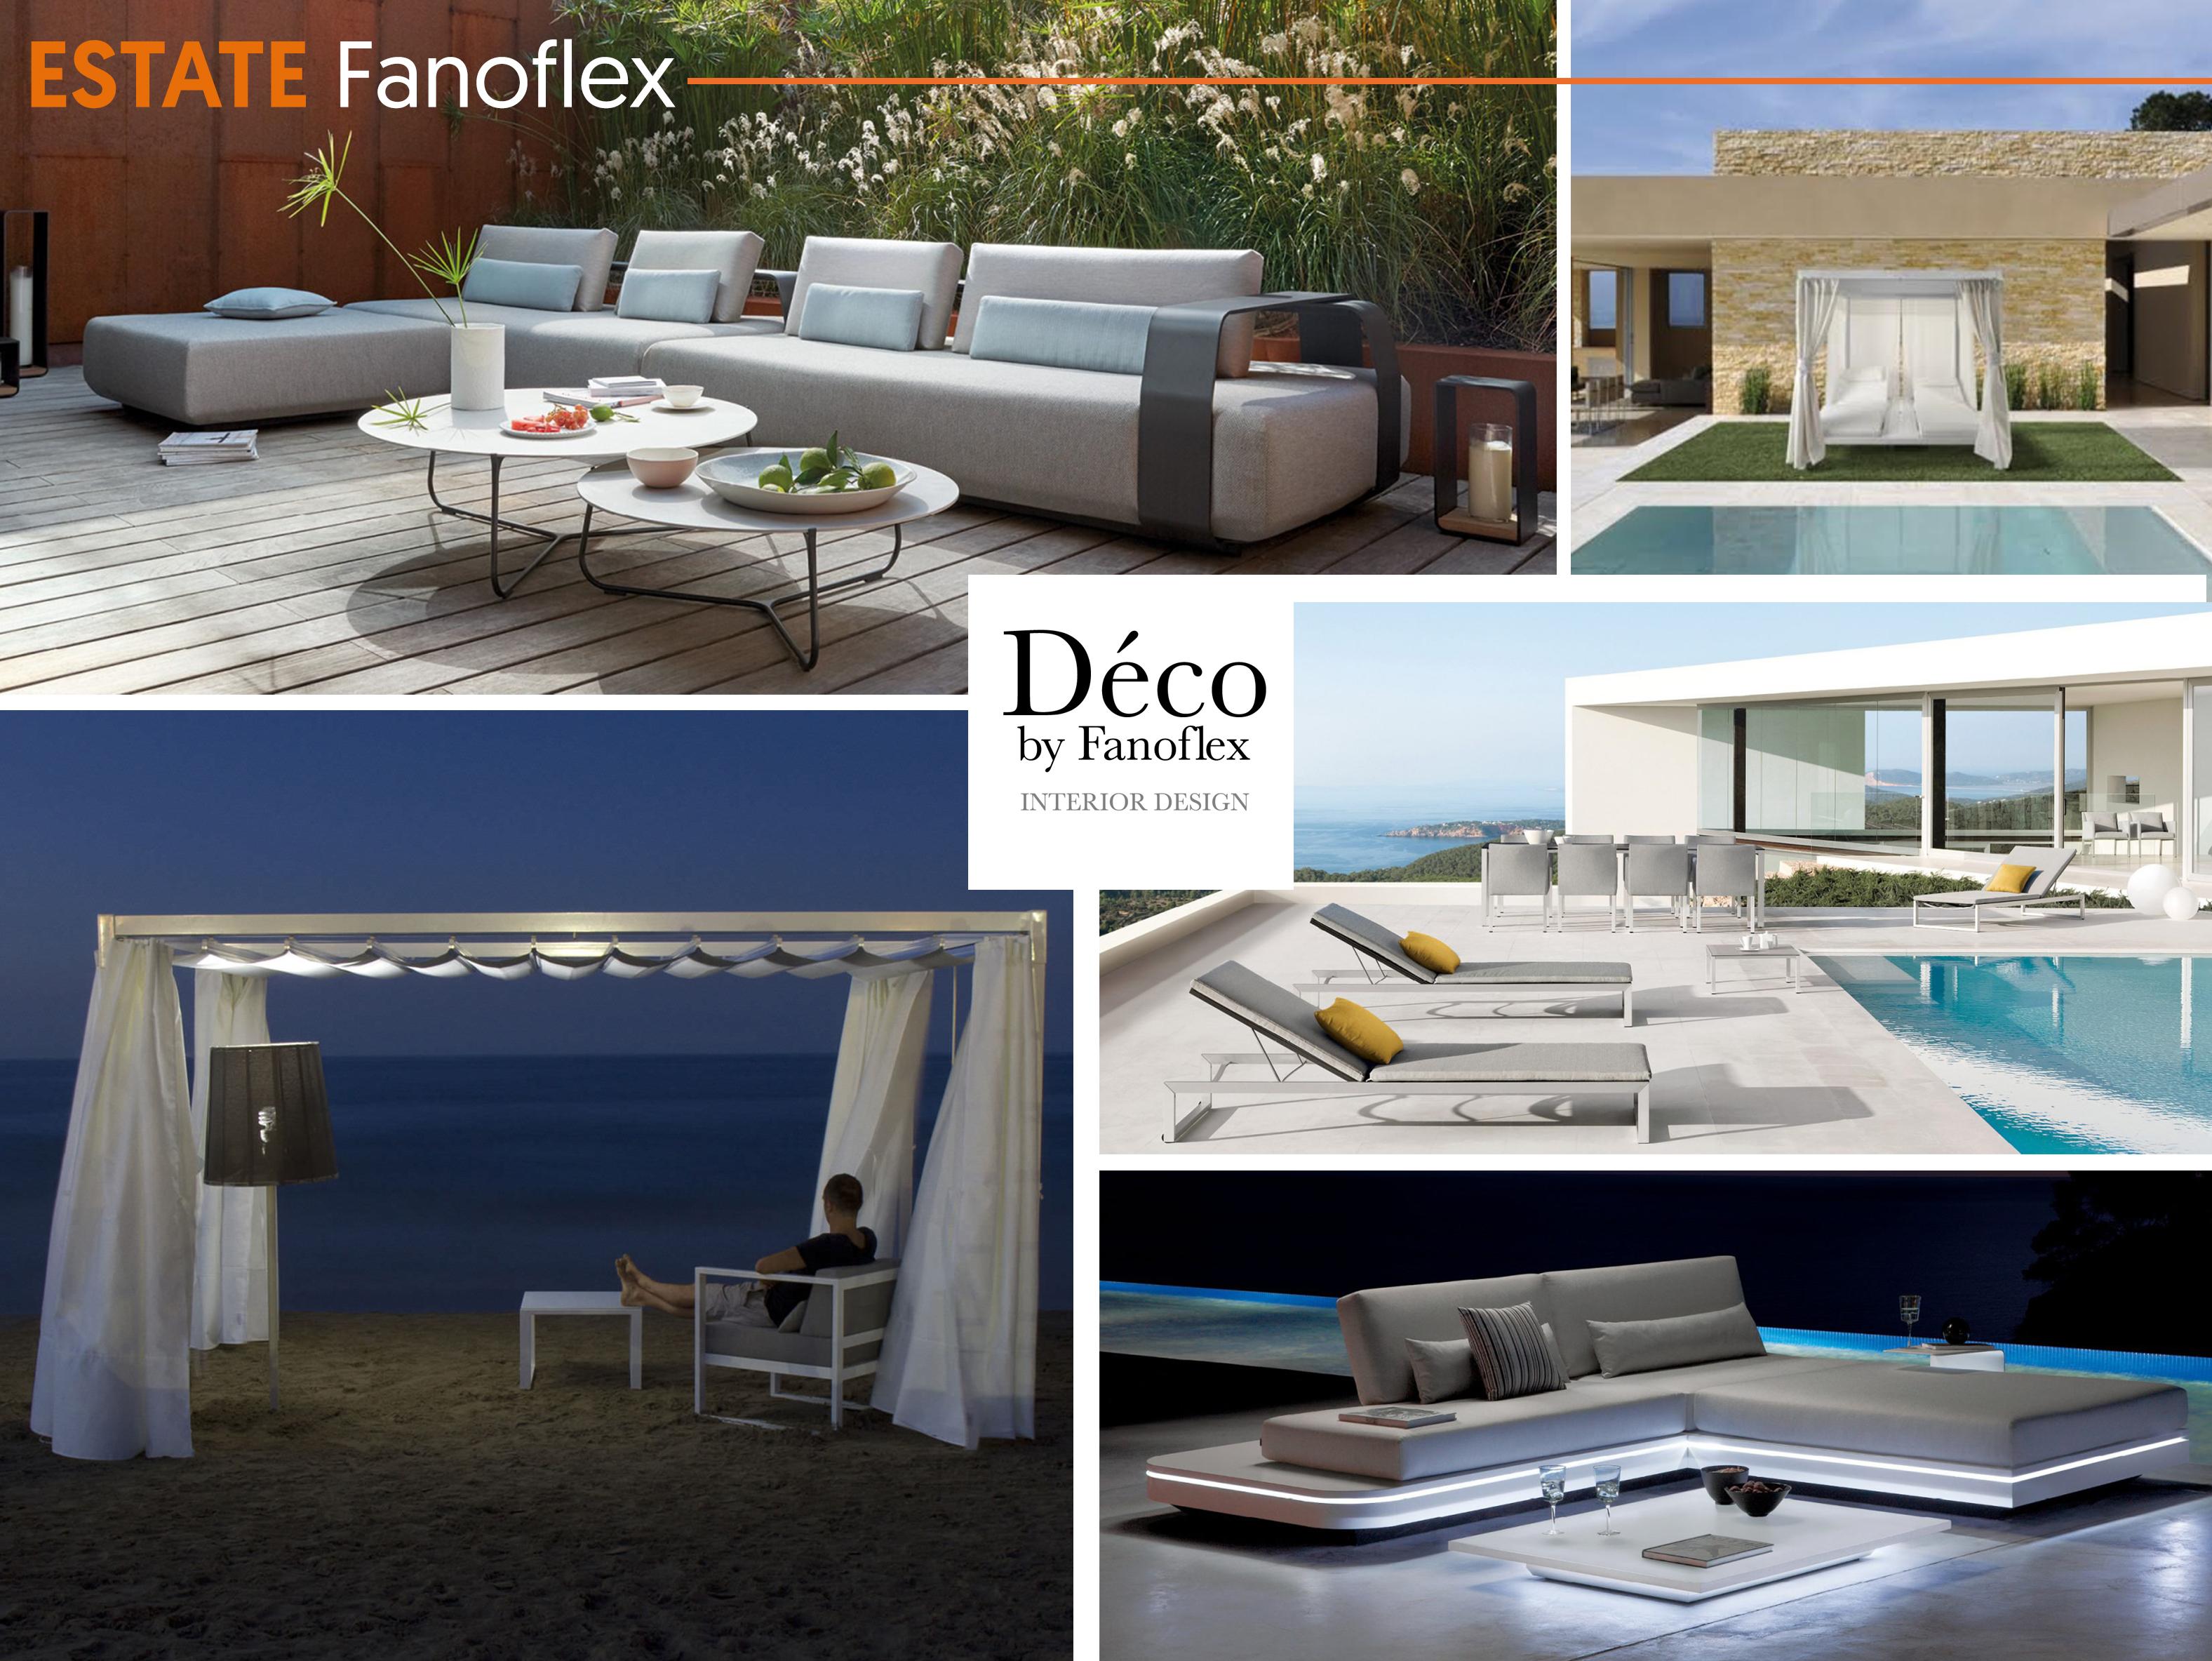 estate-fanoflex